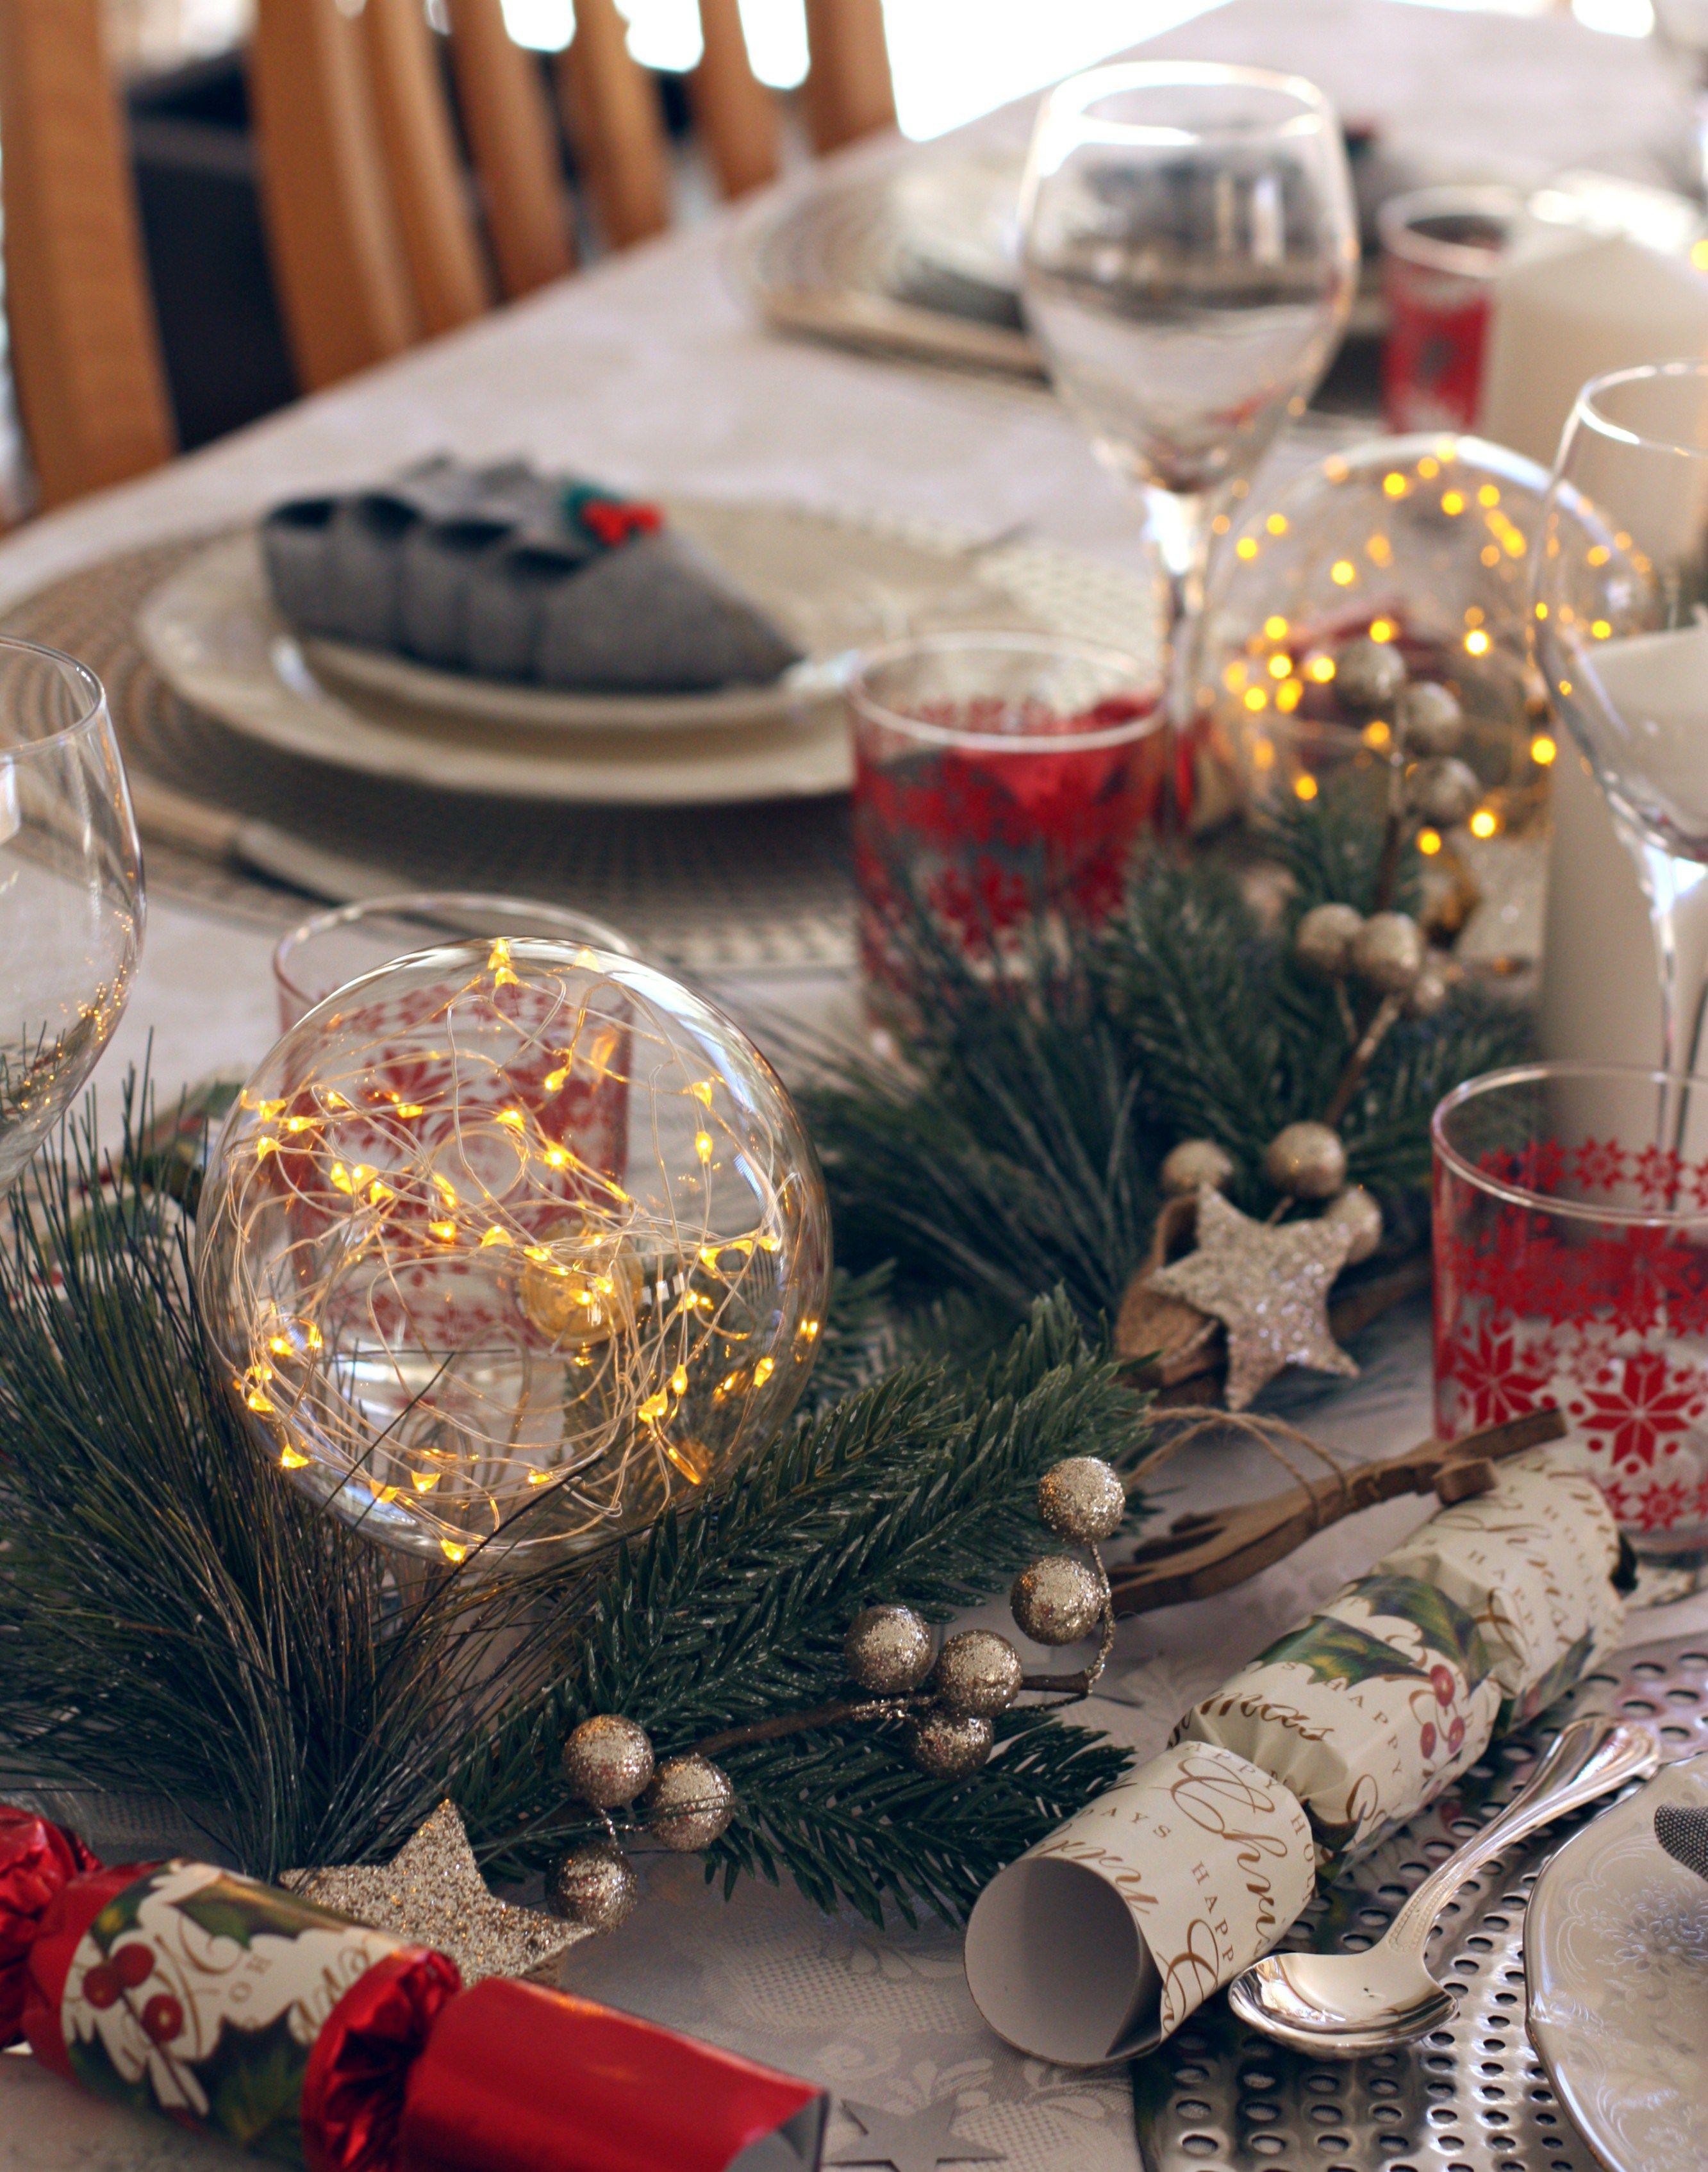 Led Fairy Light Ornaments Set Of 3 Christmas 1 Christmas